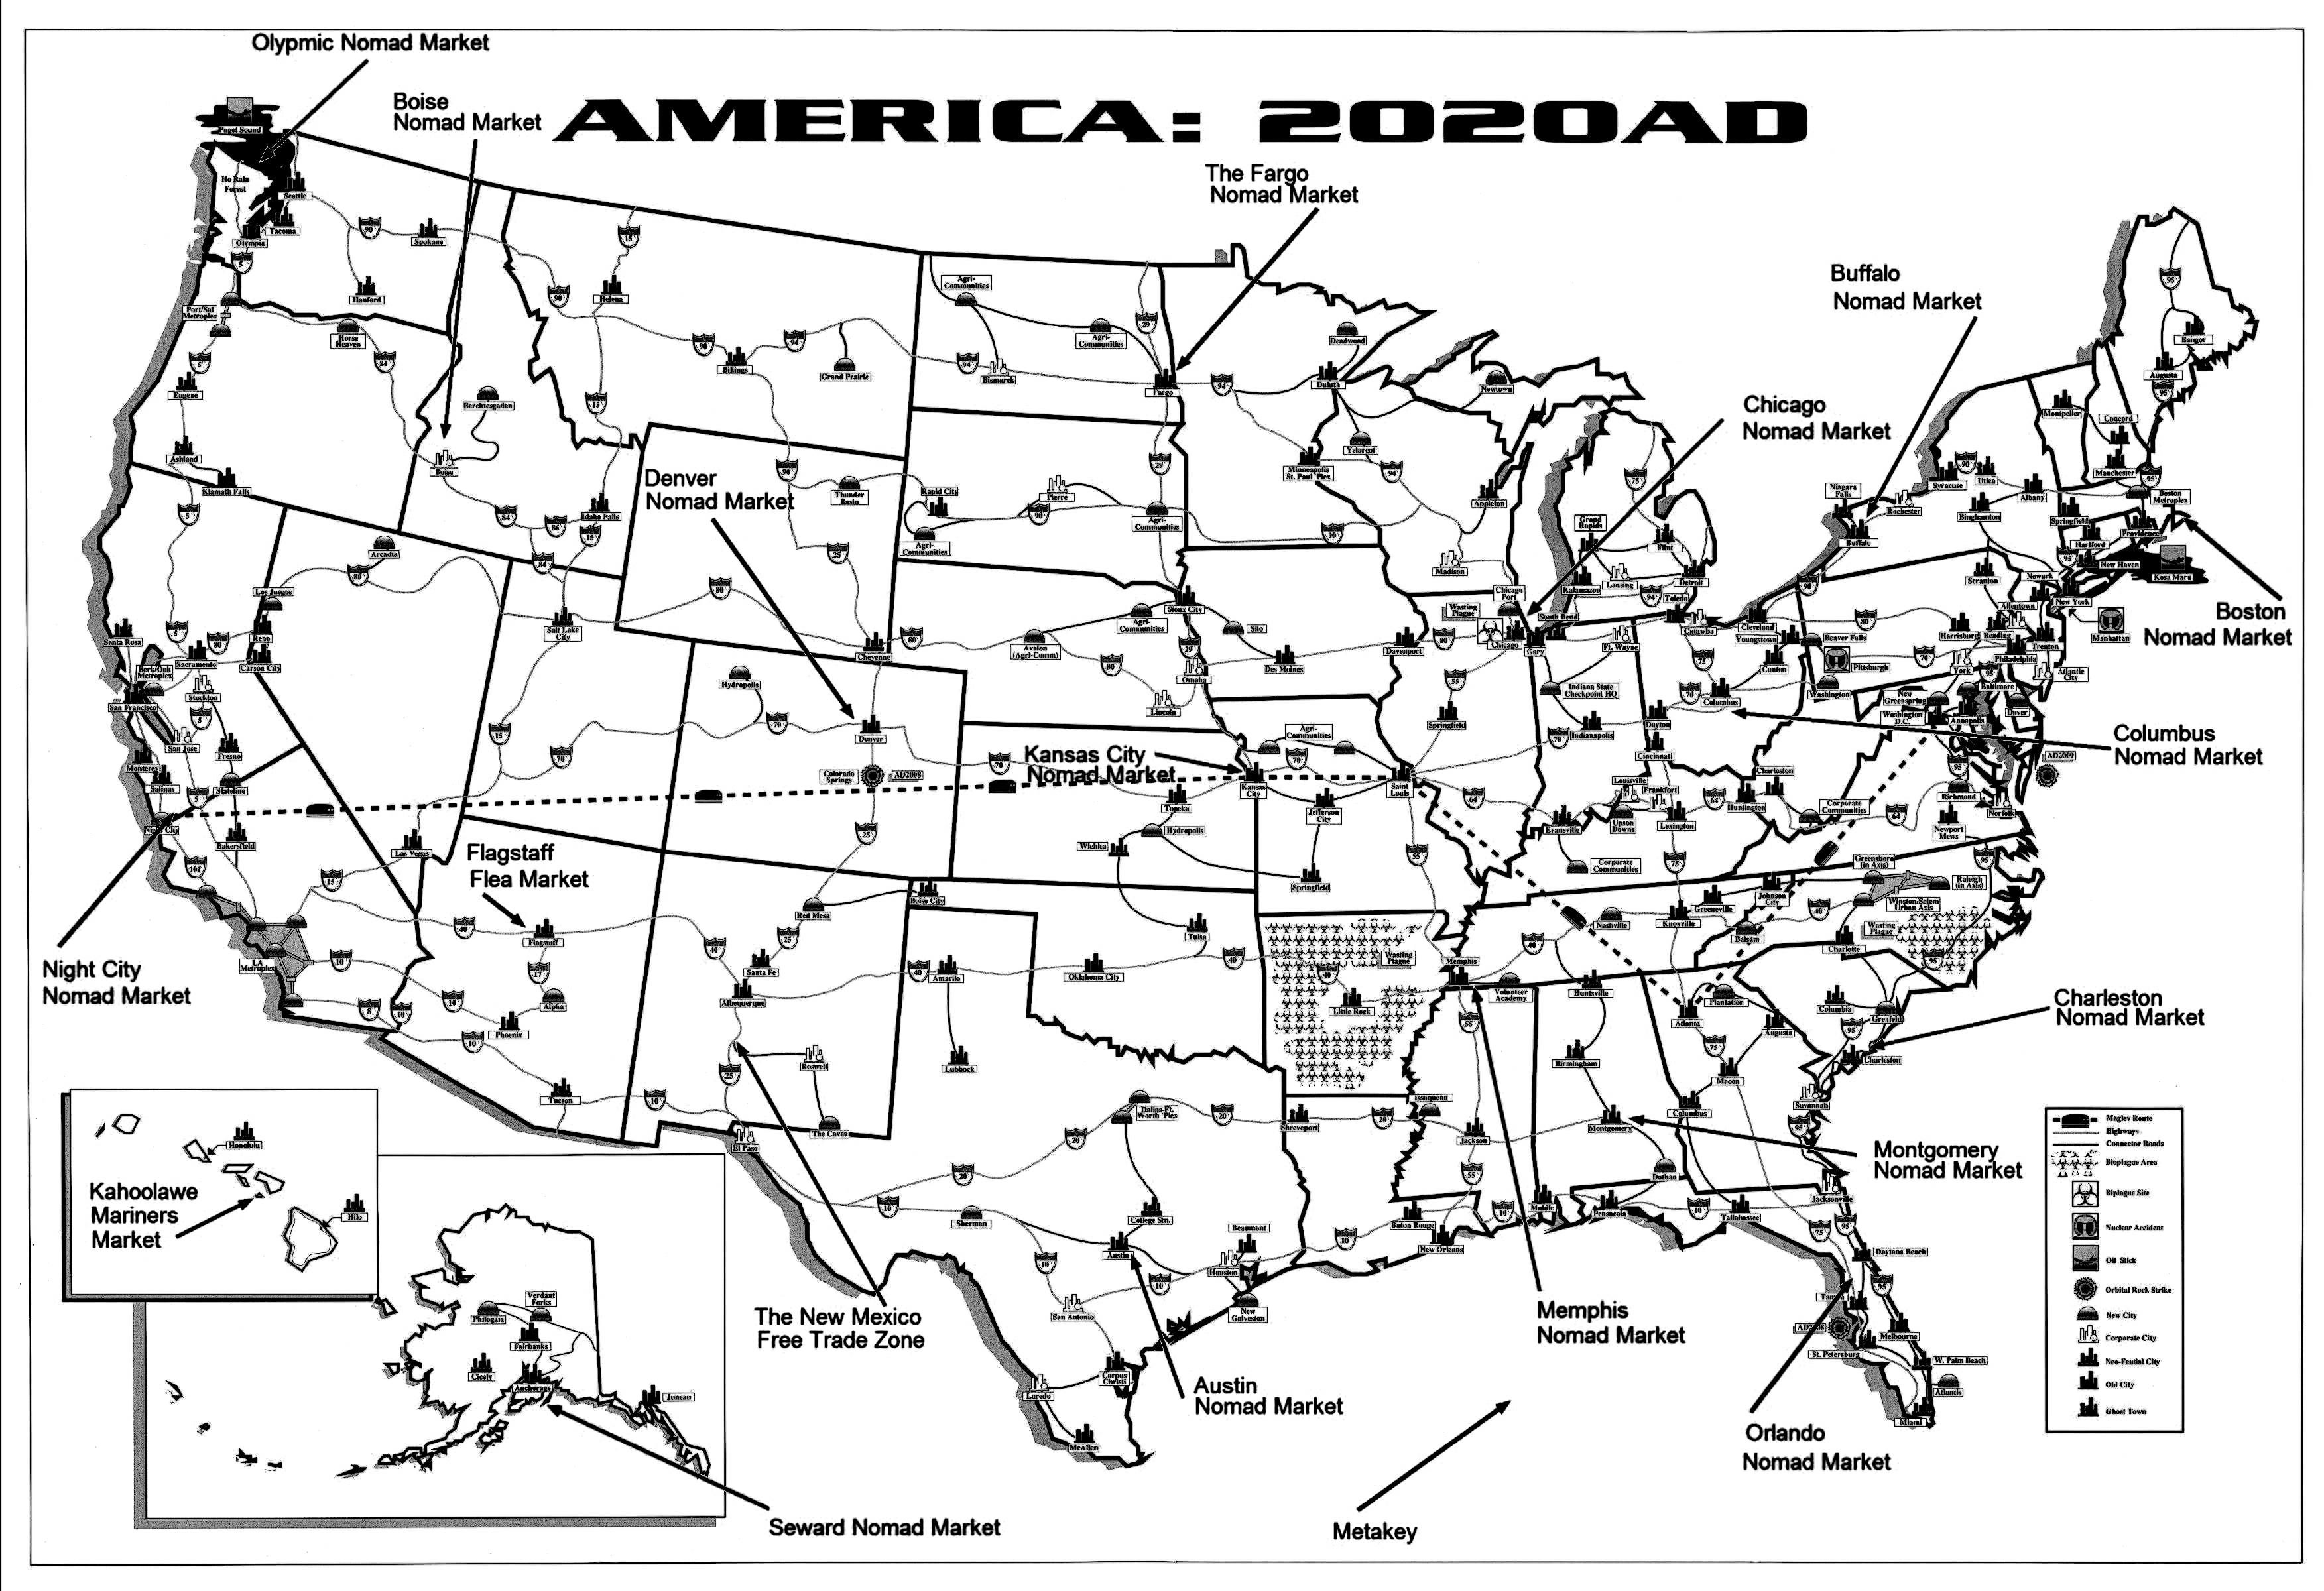 Cyberpunk 2020 World Map | Current Red Tide Florida Map